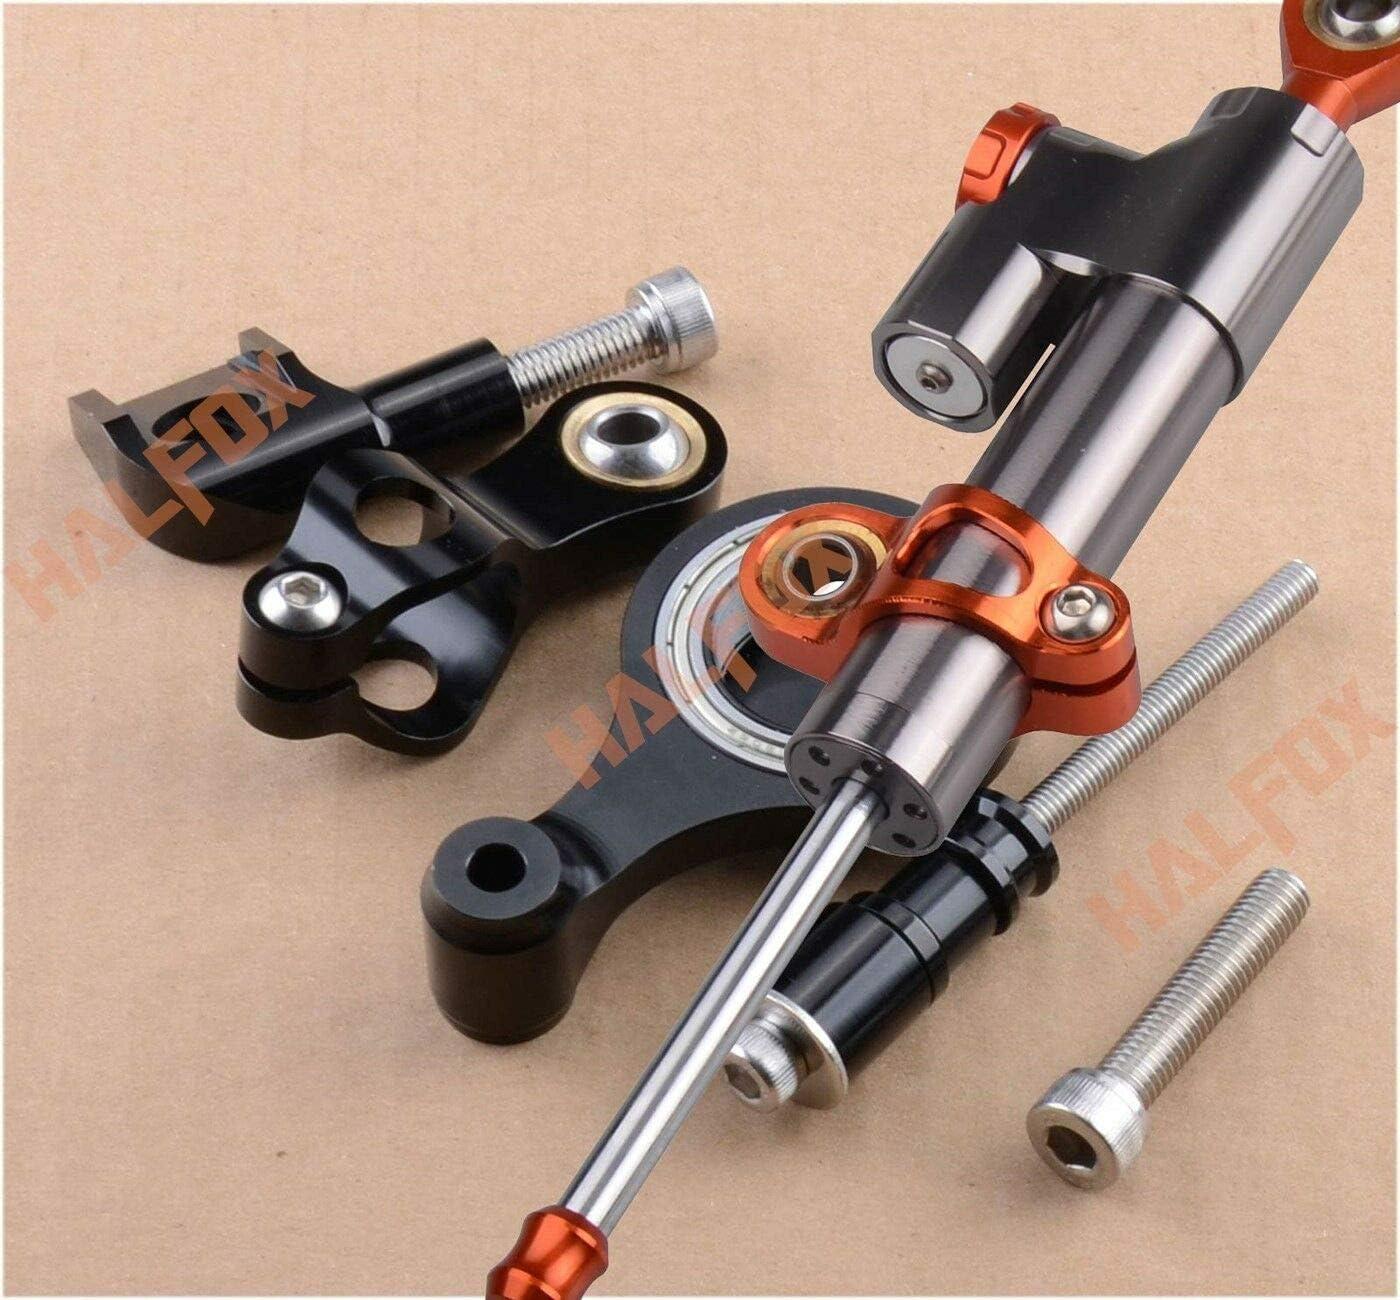 FidgetGear CNC Steering Damper Stabilizer and Bracket for Yamaha YZF R6 06-16 R1 09-12 Gold Gray+Orange